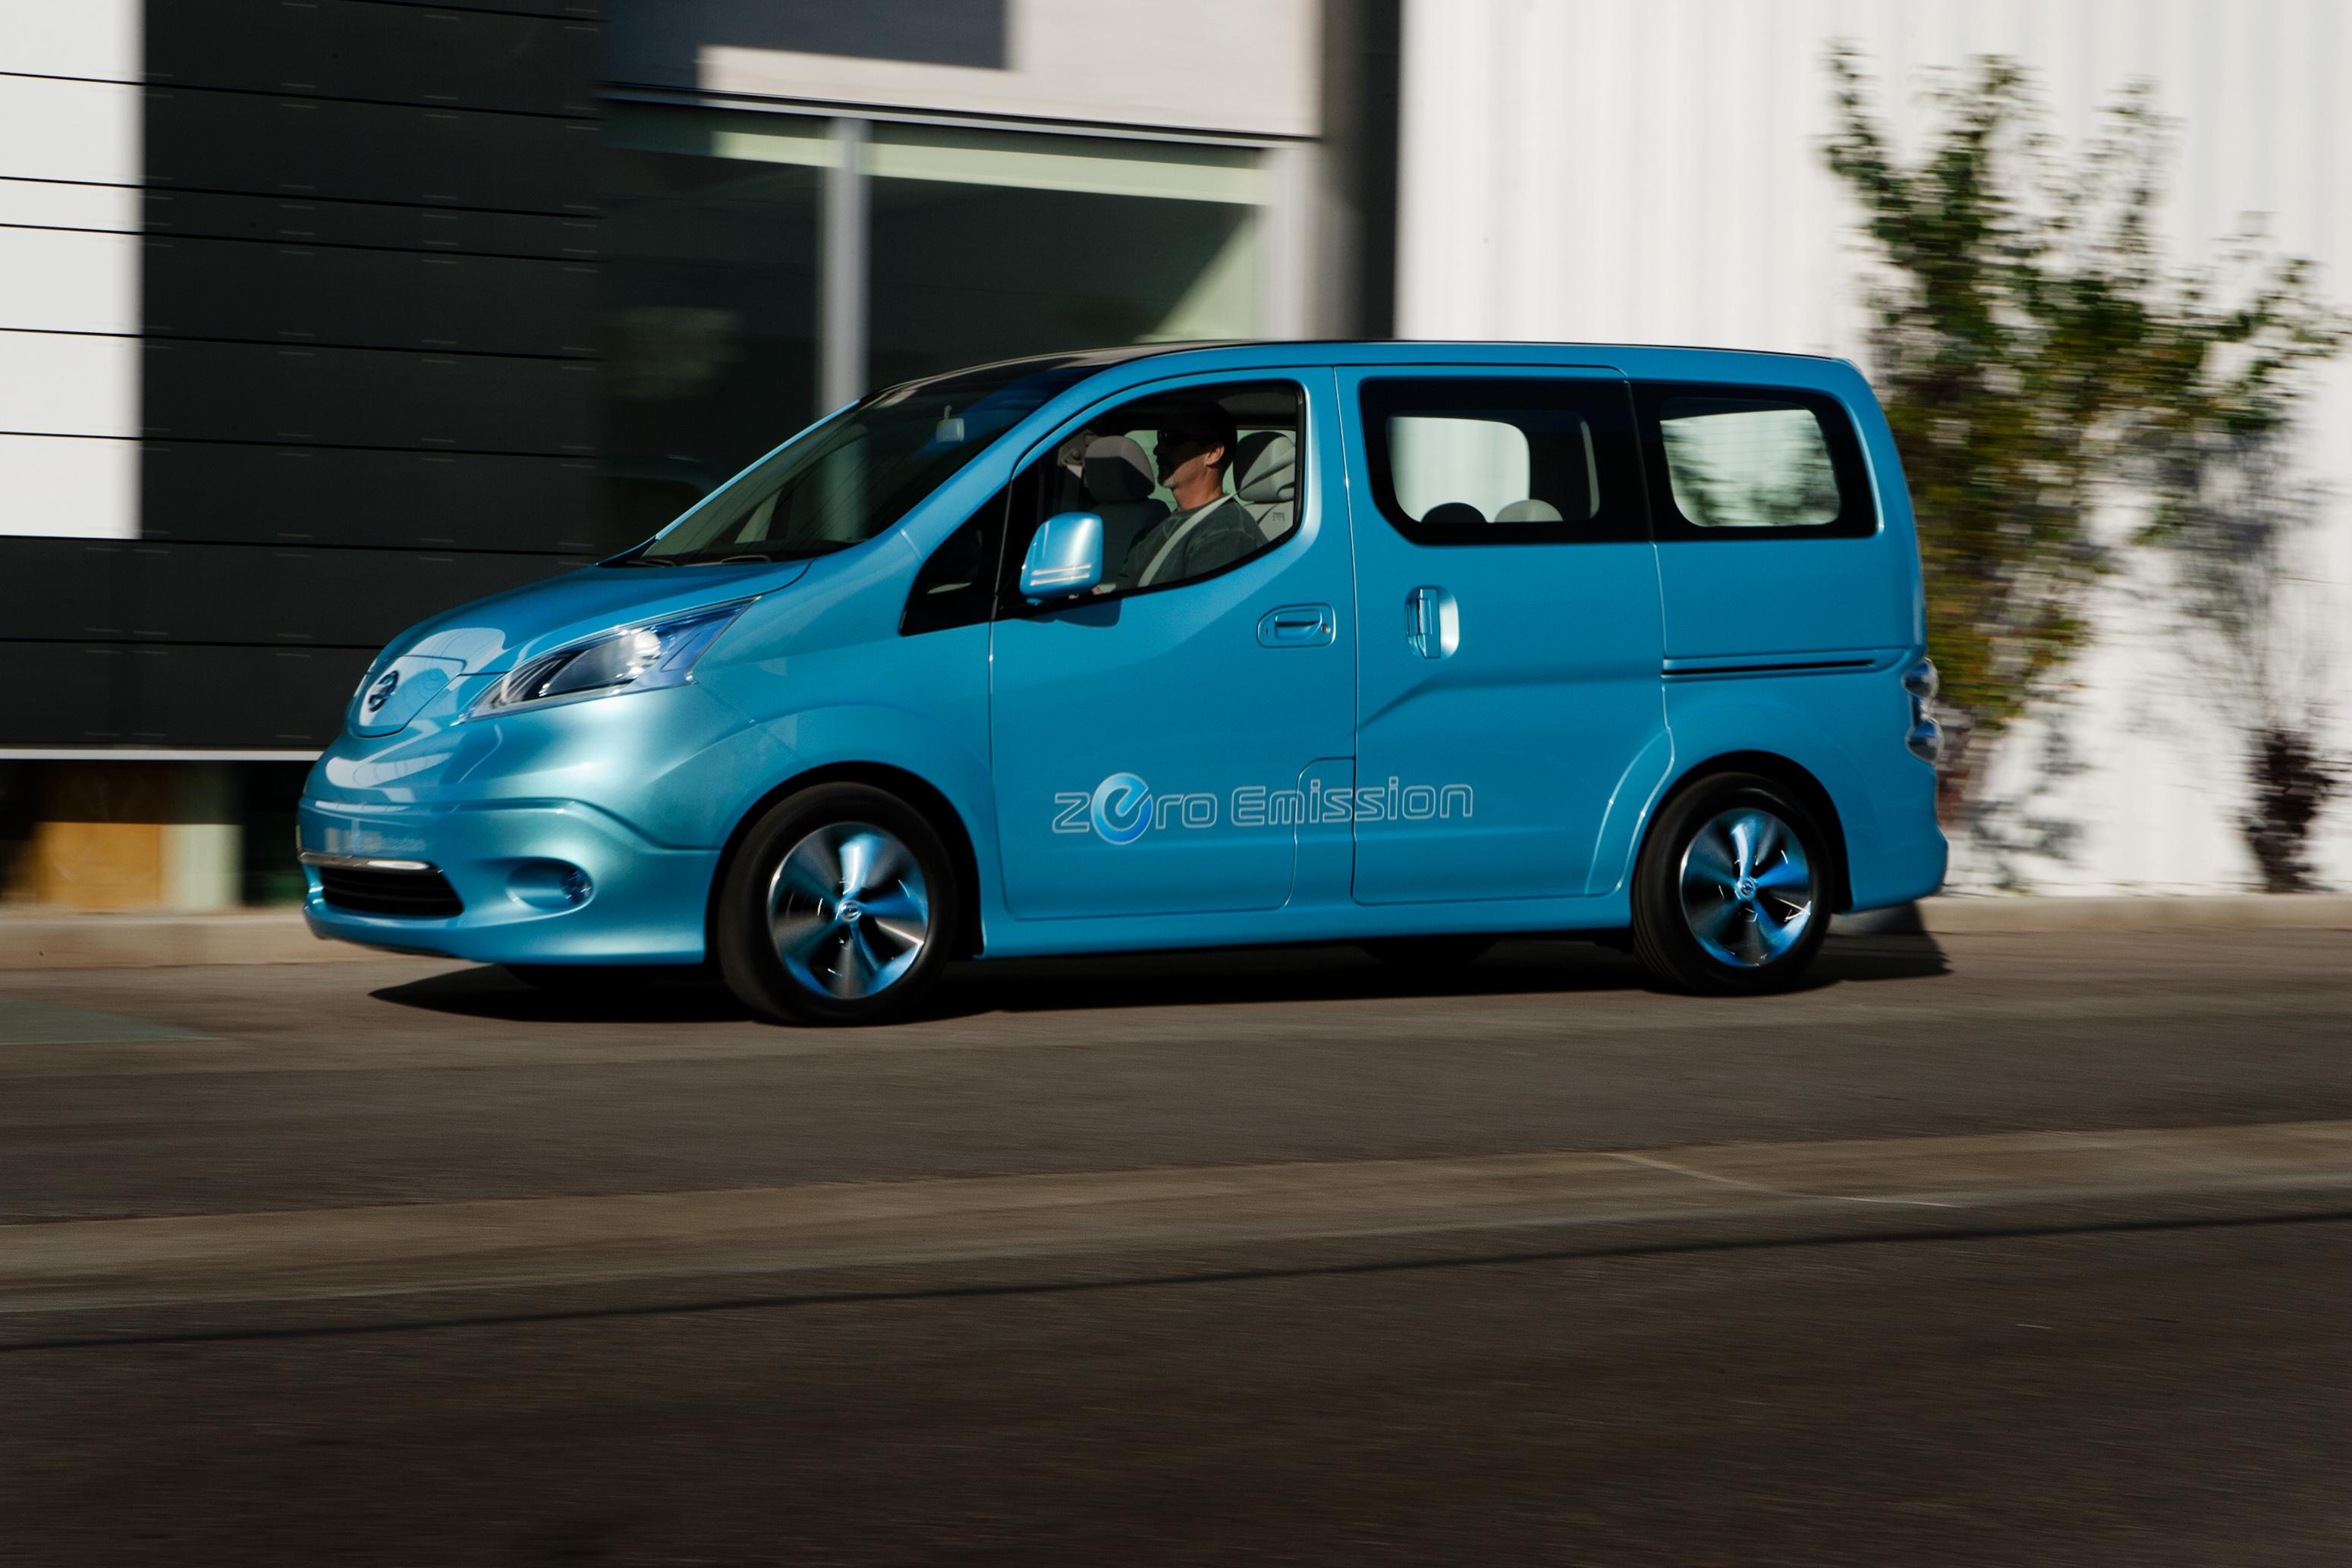 Nissan's e-NV200 Concept Van